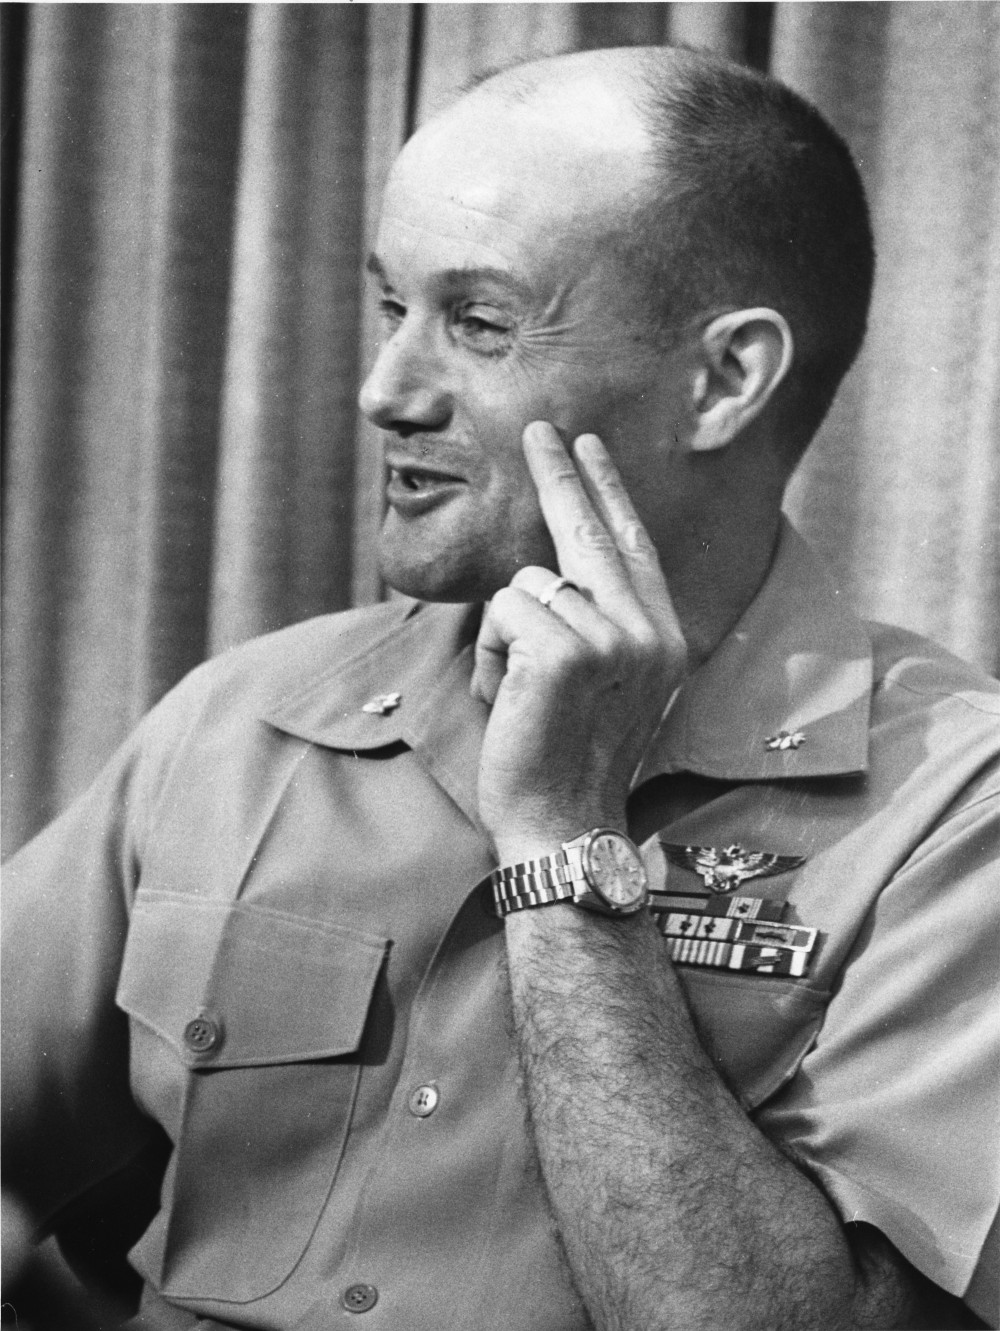 Lt Col J. Howard Dunn, US Naval Hospital, Jacksonville, FL During Press Interview